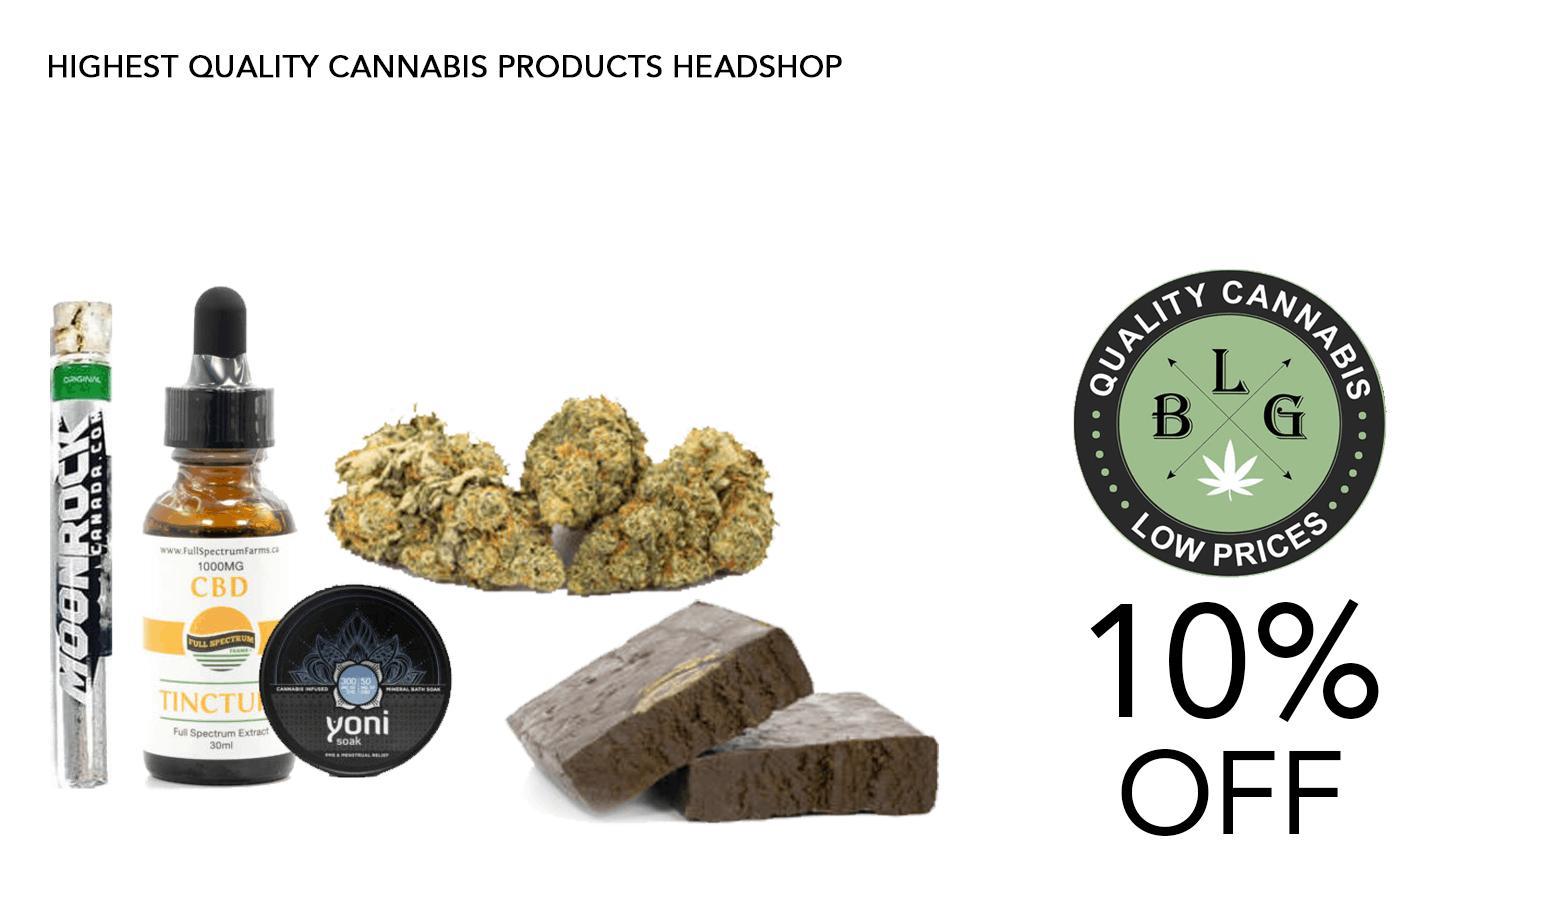 BuyLowGreen Cannabis Coupon Code Offer Website